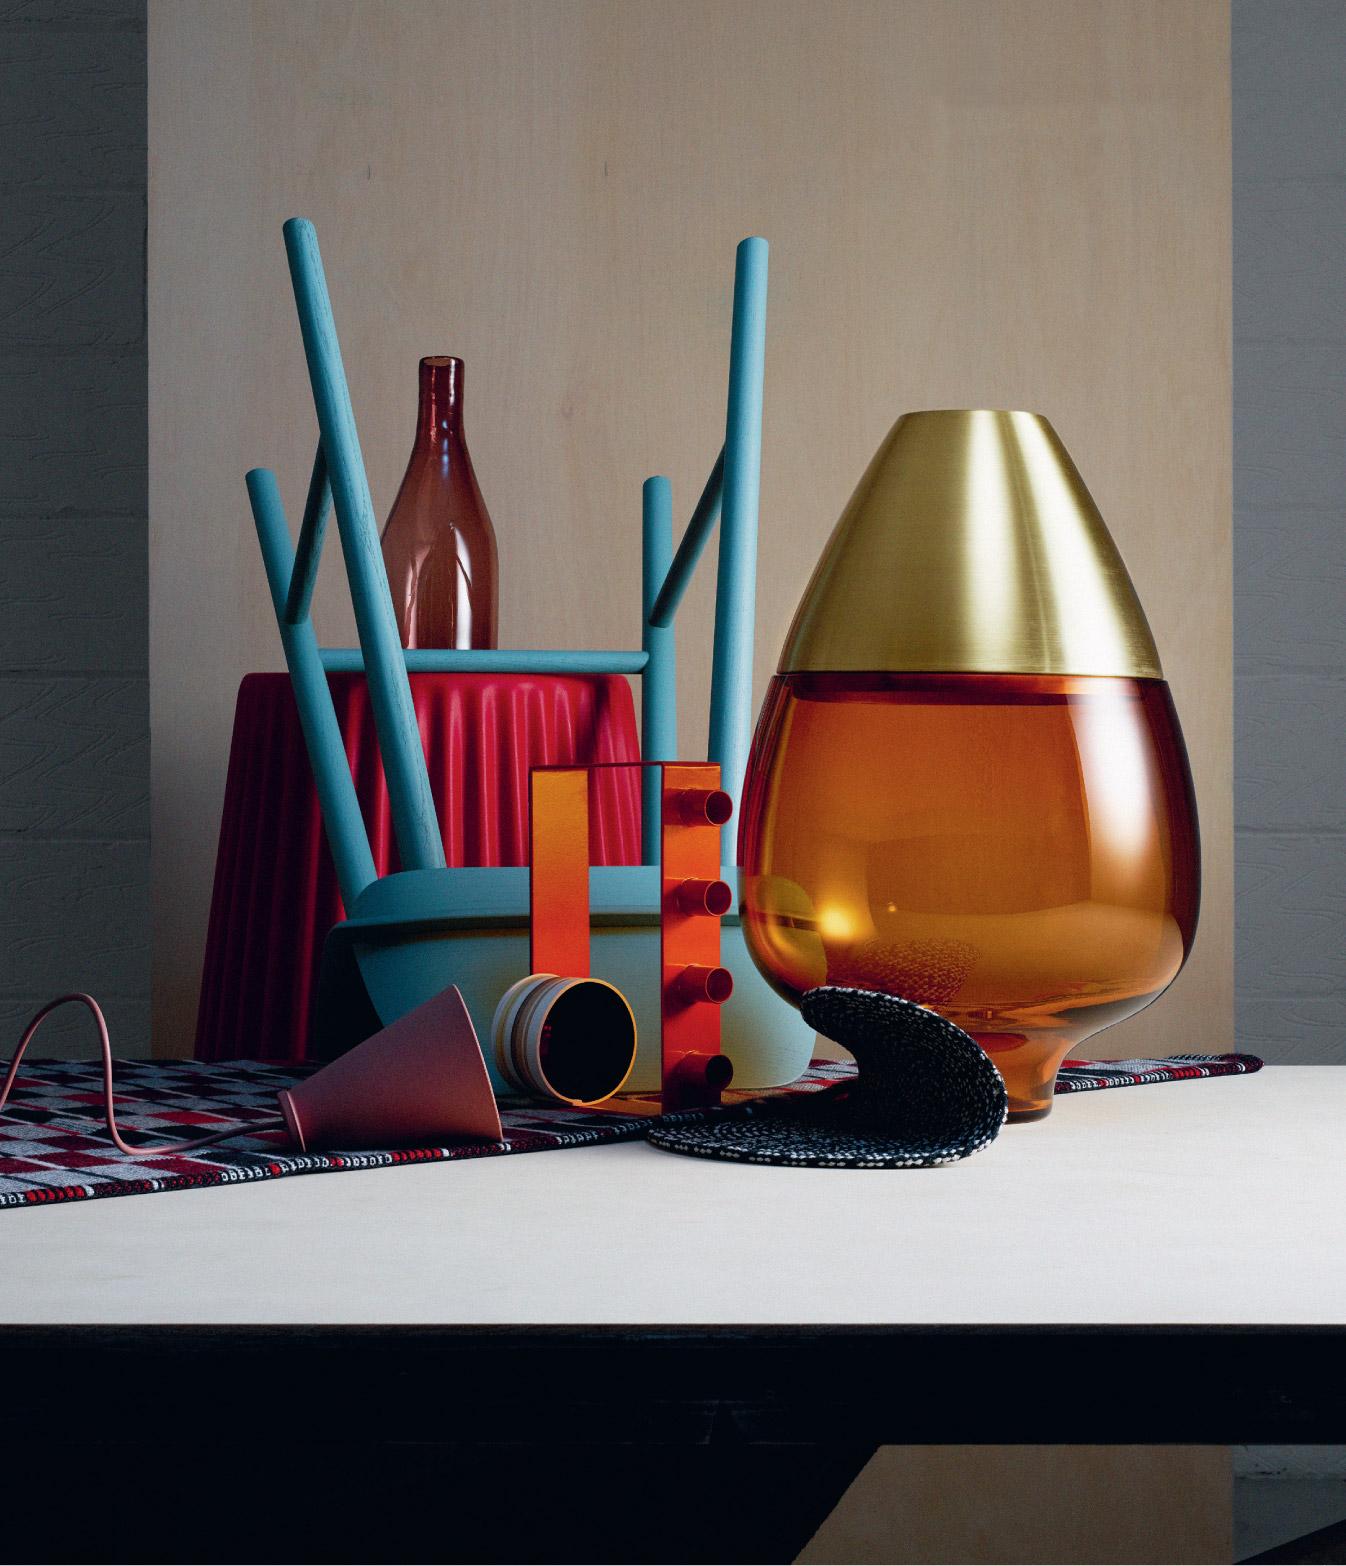 ▲ Product arrangement for a Hole & Corner magazine photo shoot , showing 'Gerbera' Vase on pedestal